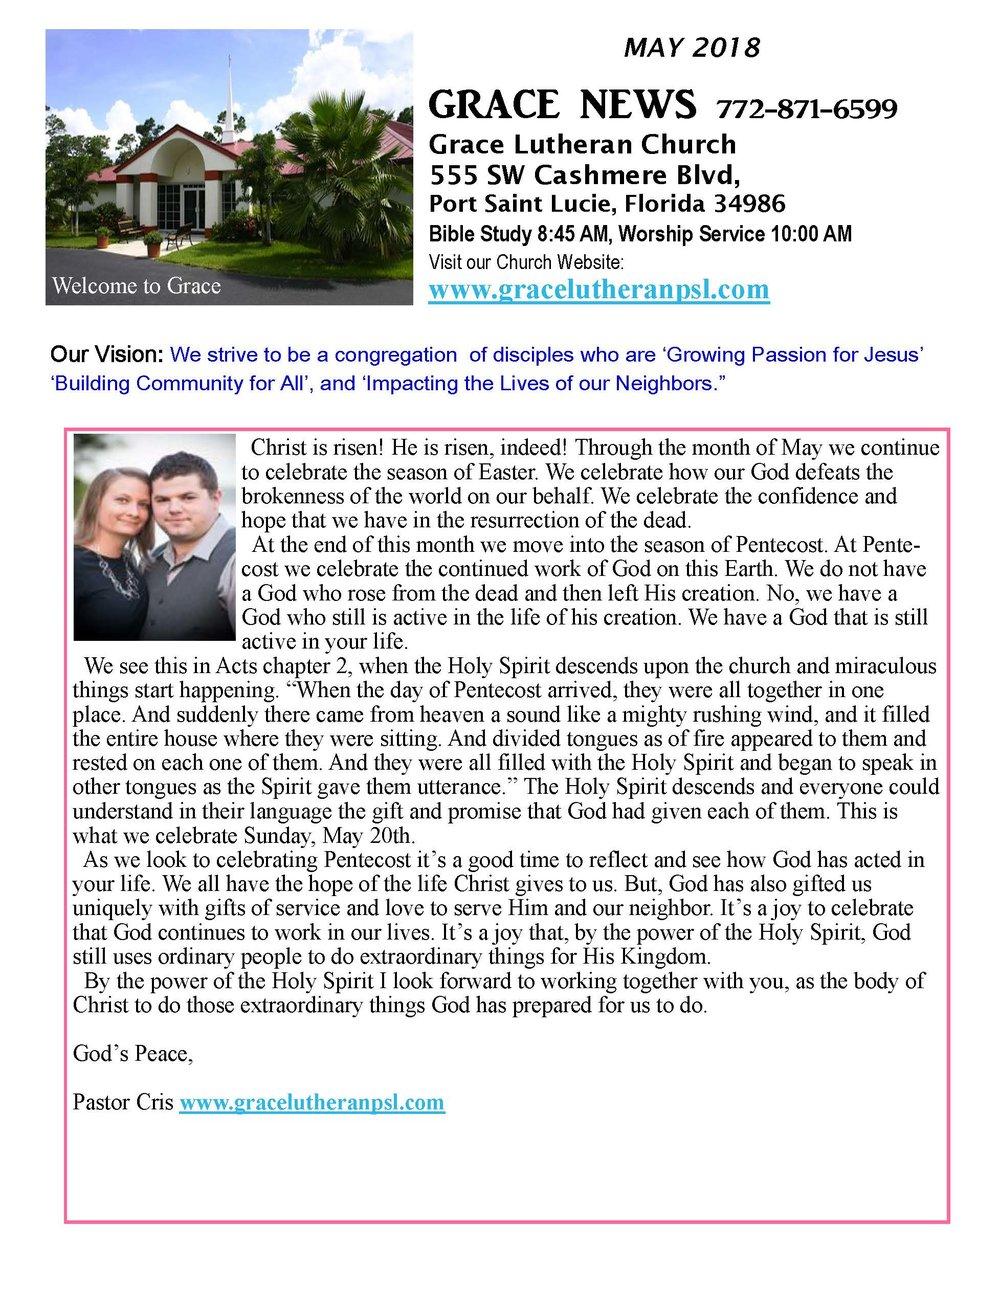 Grace News Ltr May 2018 pub (1)_Page_01.jpg